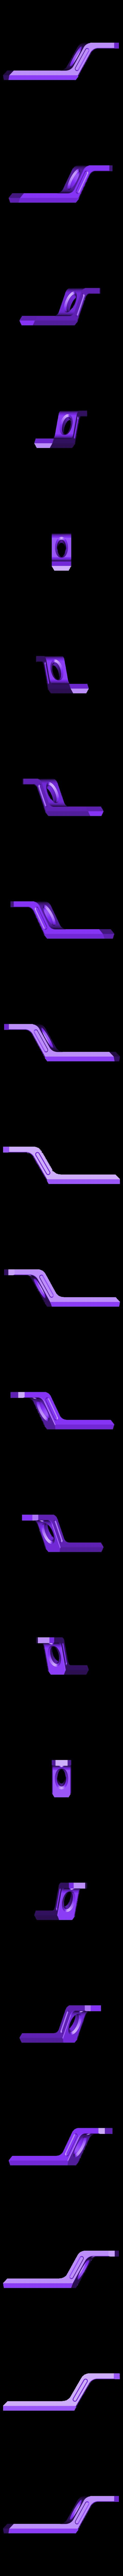 Follow_Focus_Support.STL Download STL file 3D_Print_Follow_Focus_V2.0 • 3D printable template, SWANGLEI